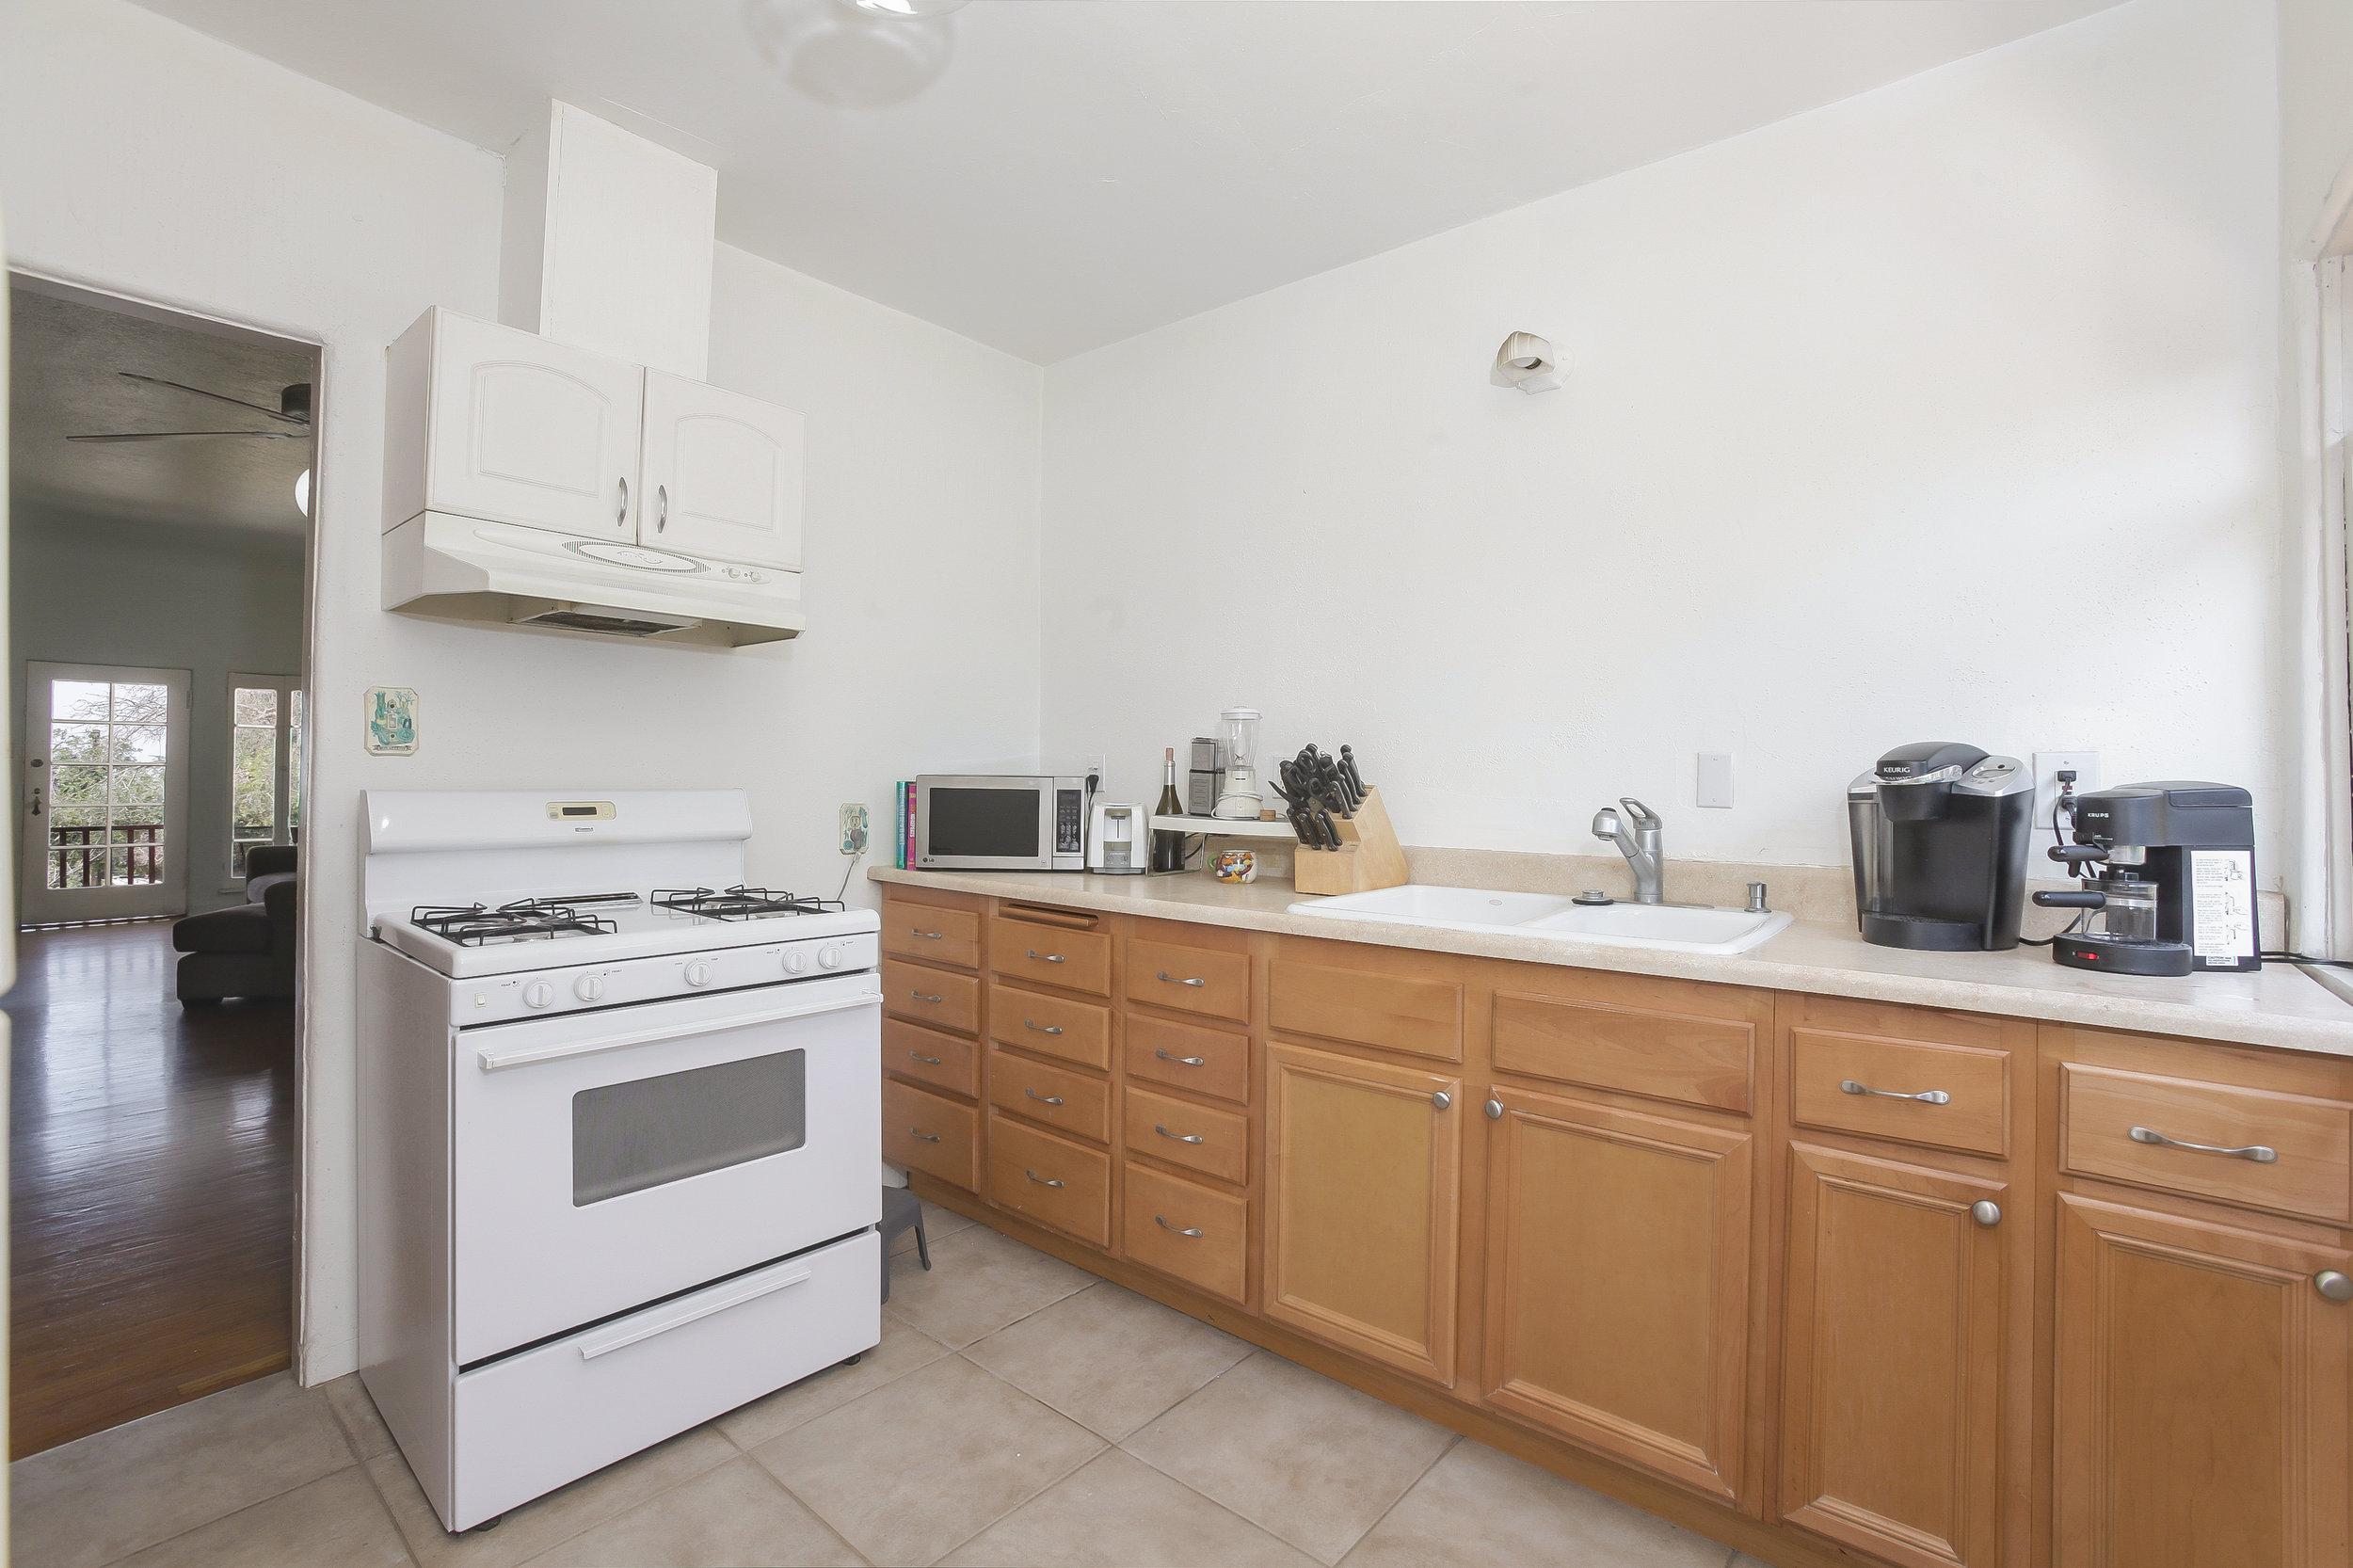 030-Kitchen-4526143-large.jpg